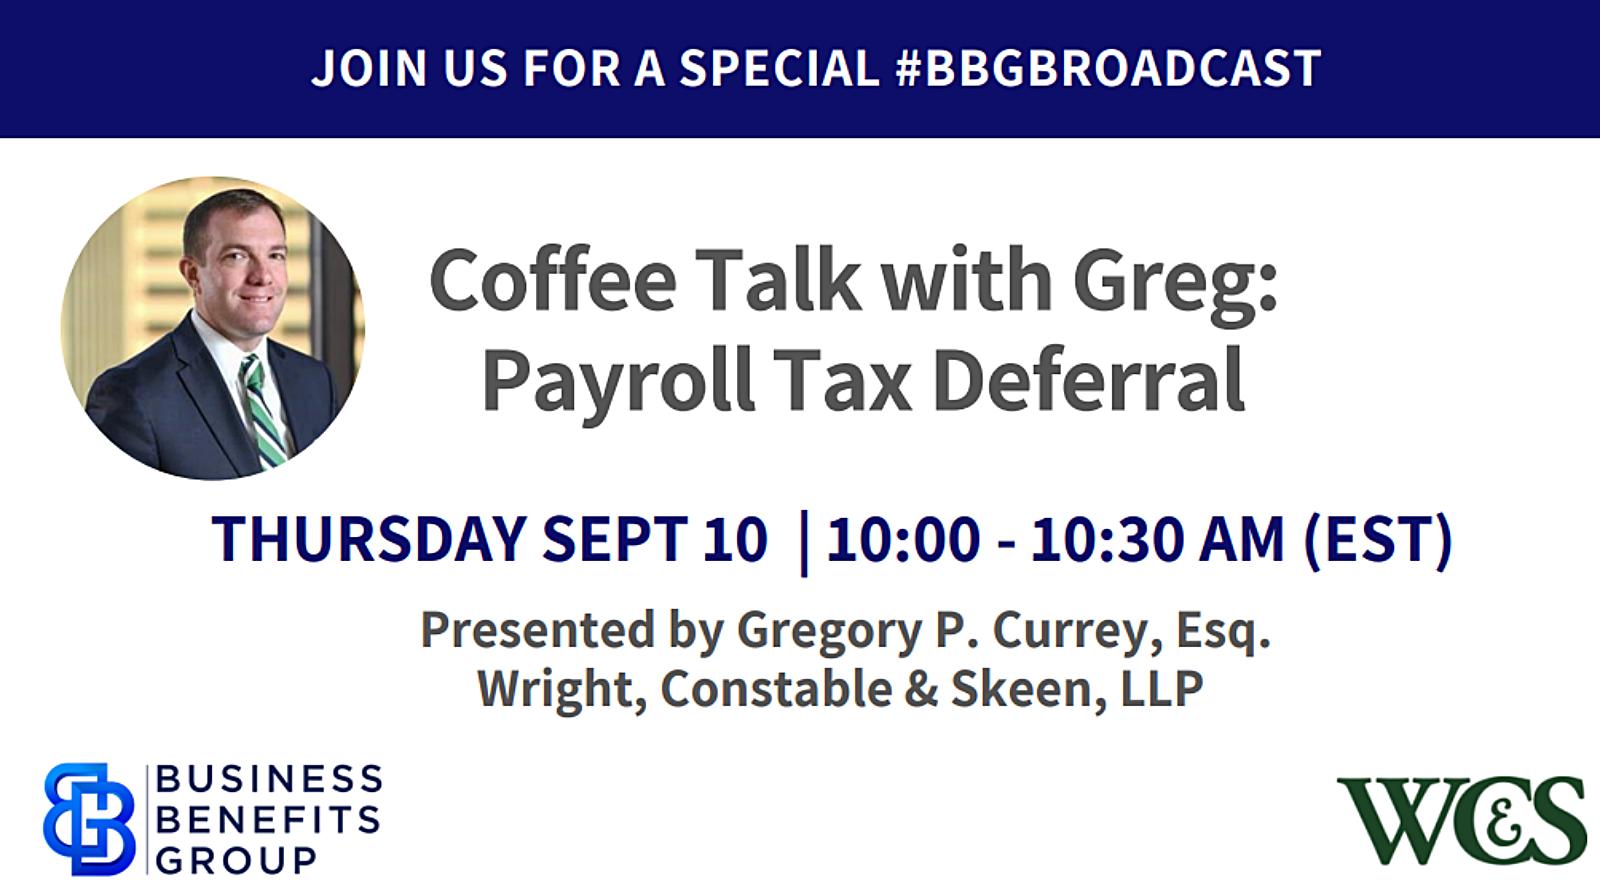 Coffee Talk with Greg webinar